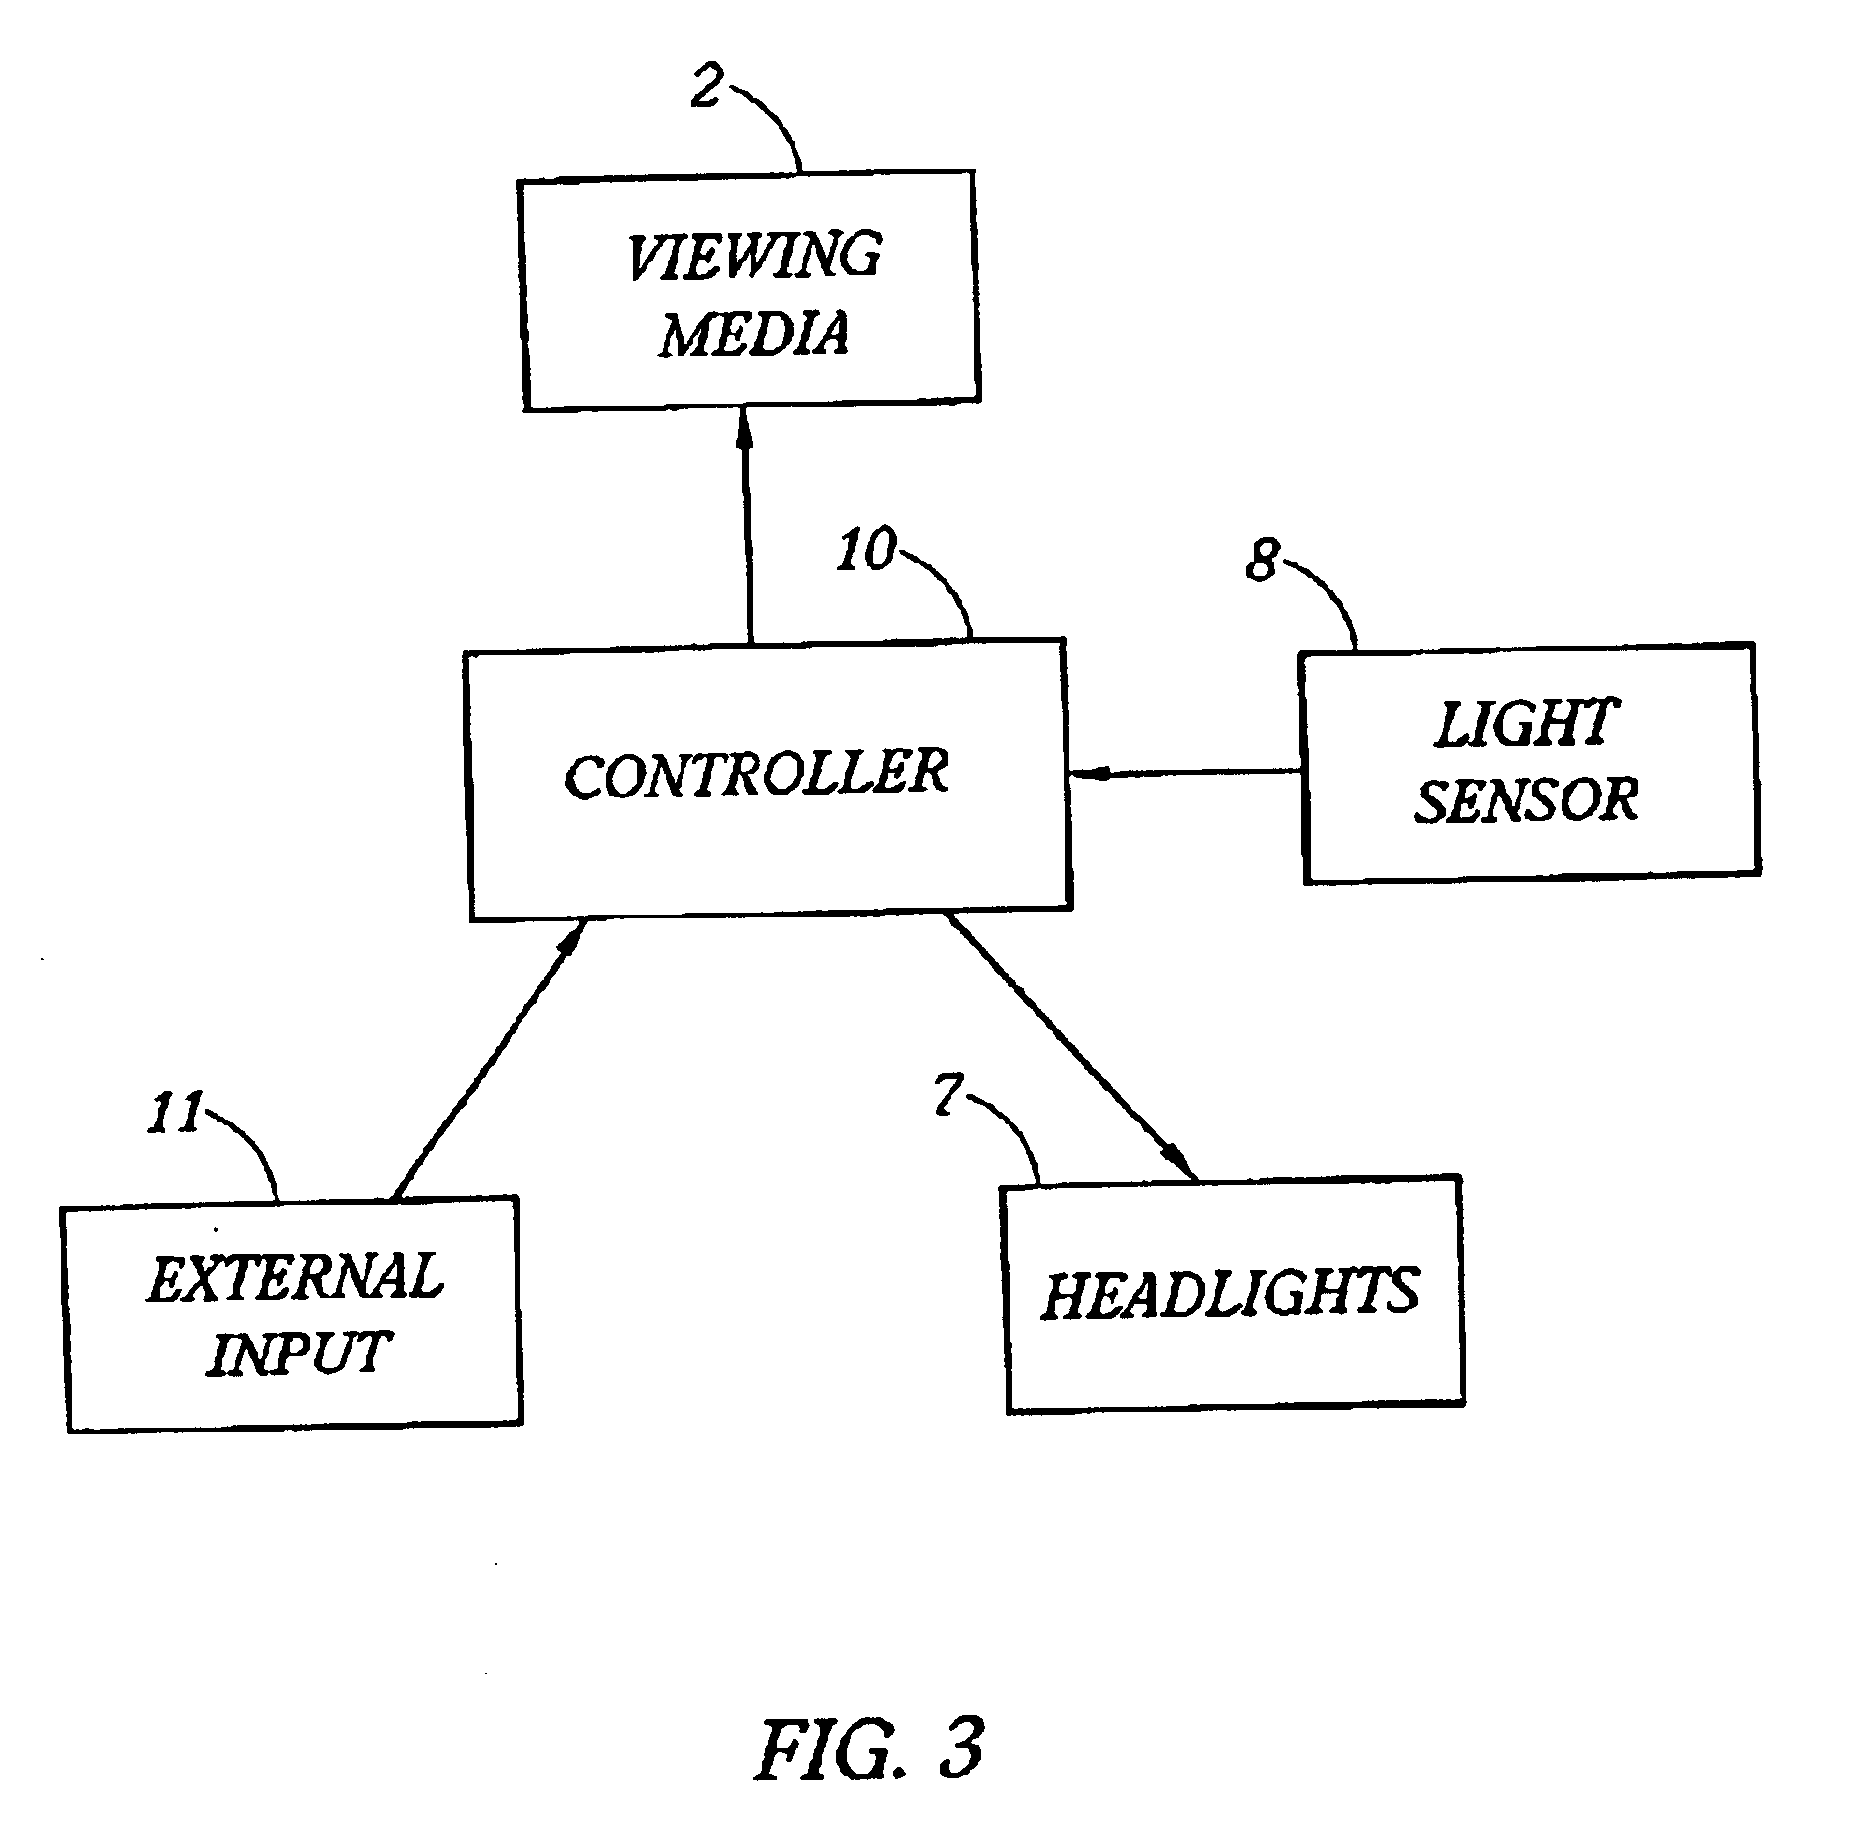 Adaptive Headlights Diagram Trusted Wiring Diagrams Lighting System For Automobiles Patent Us6733160 Shuttering Strobing Oncoming Headlight Glare Bi Xenon Vs Halogen